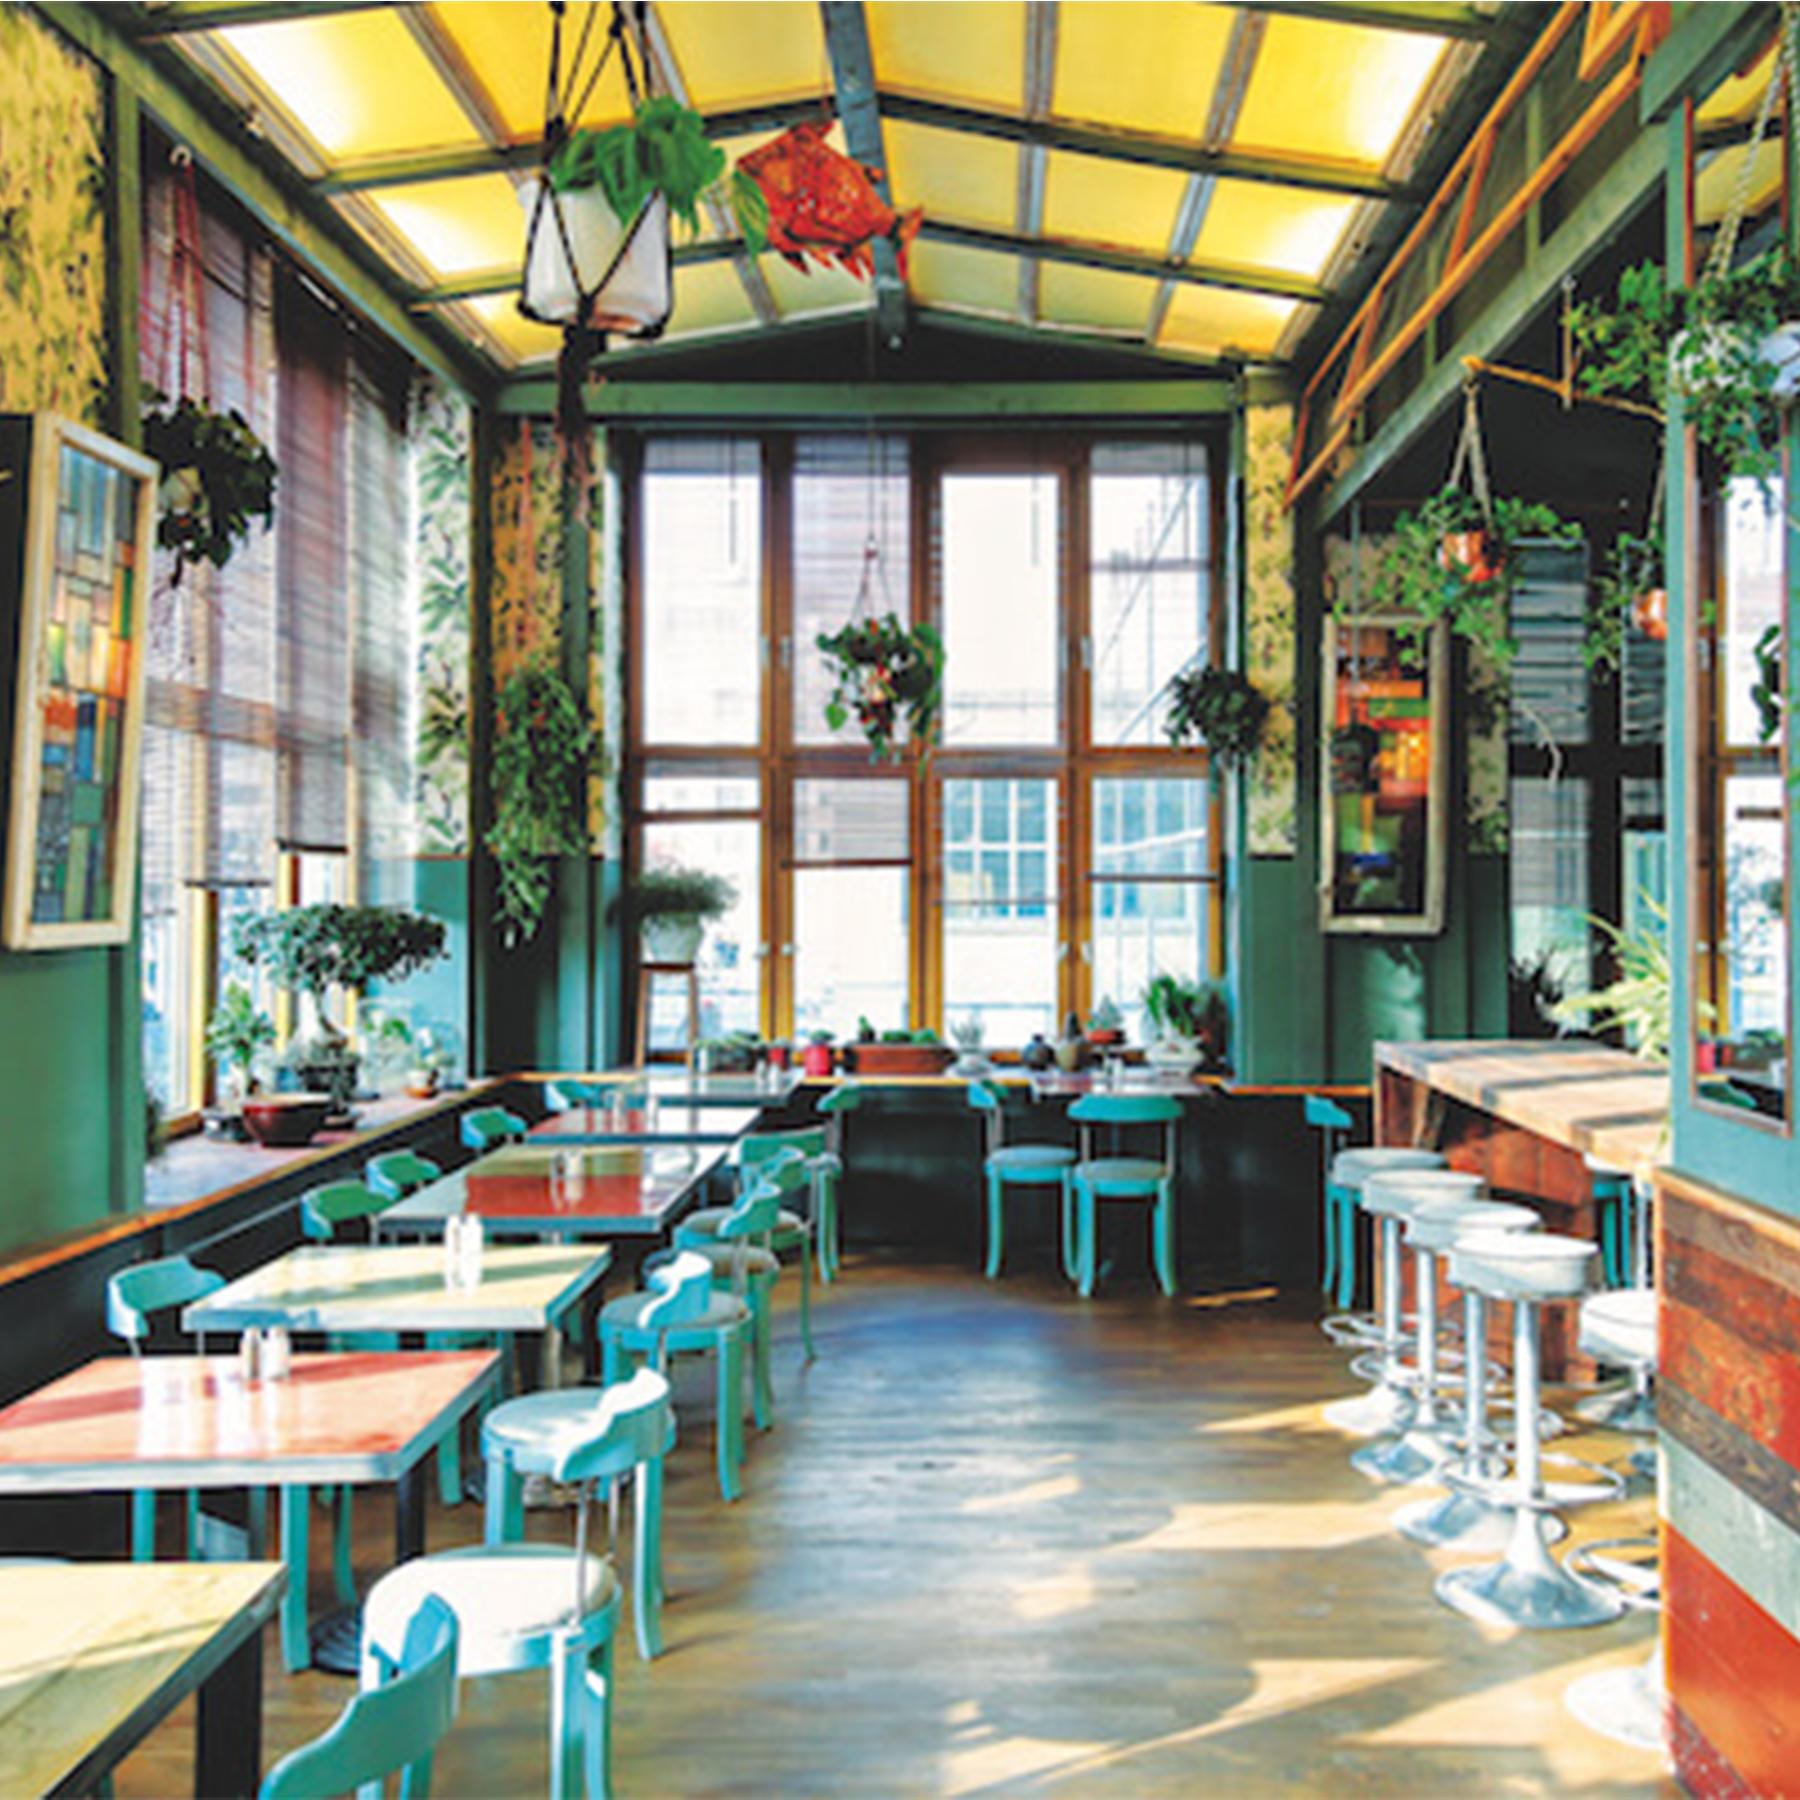 Photo:House of Small Wonder Berlin